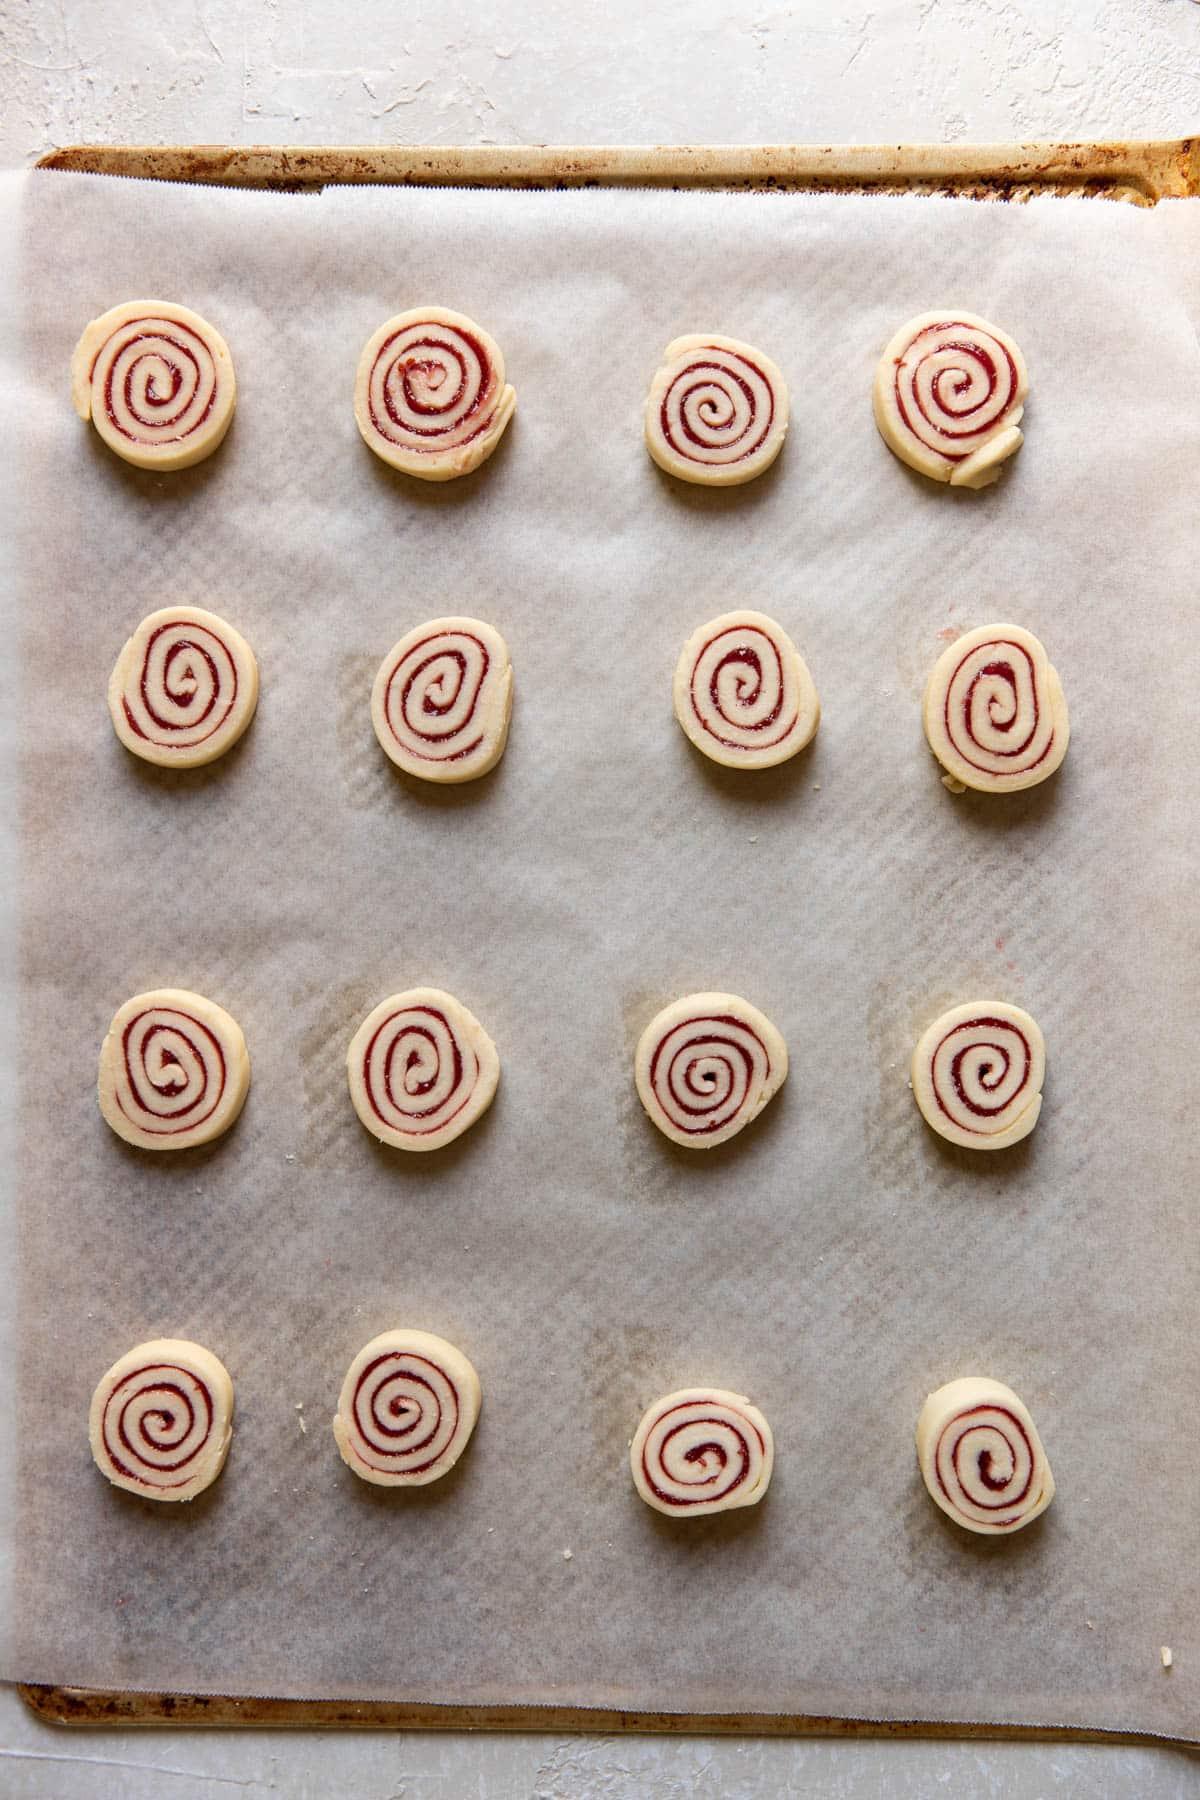 jam pinwheel cookies before baking